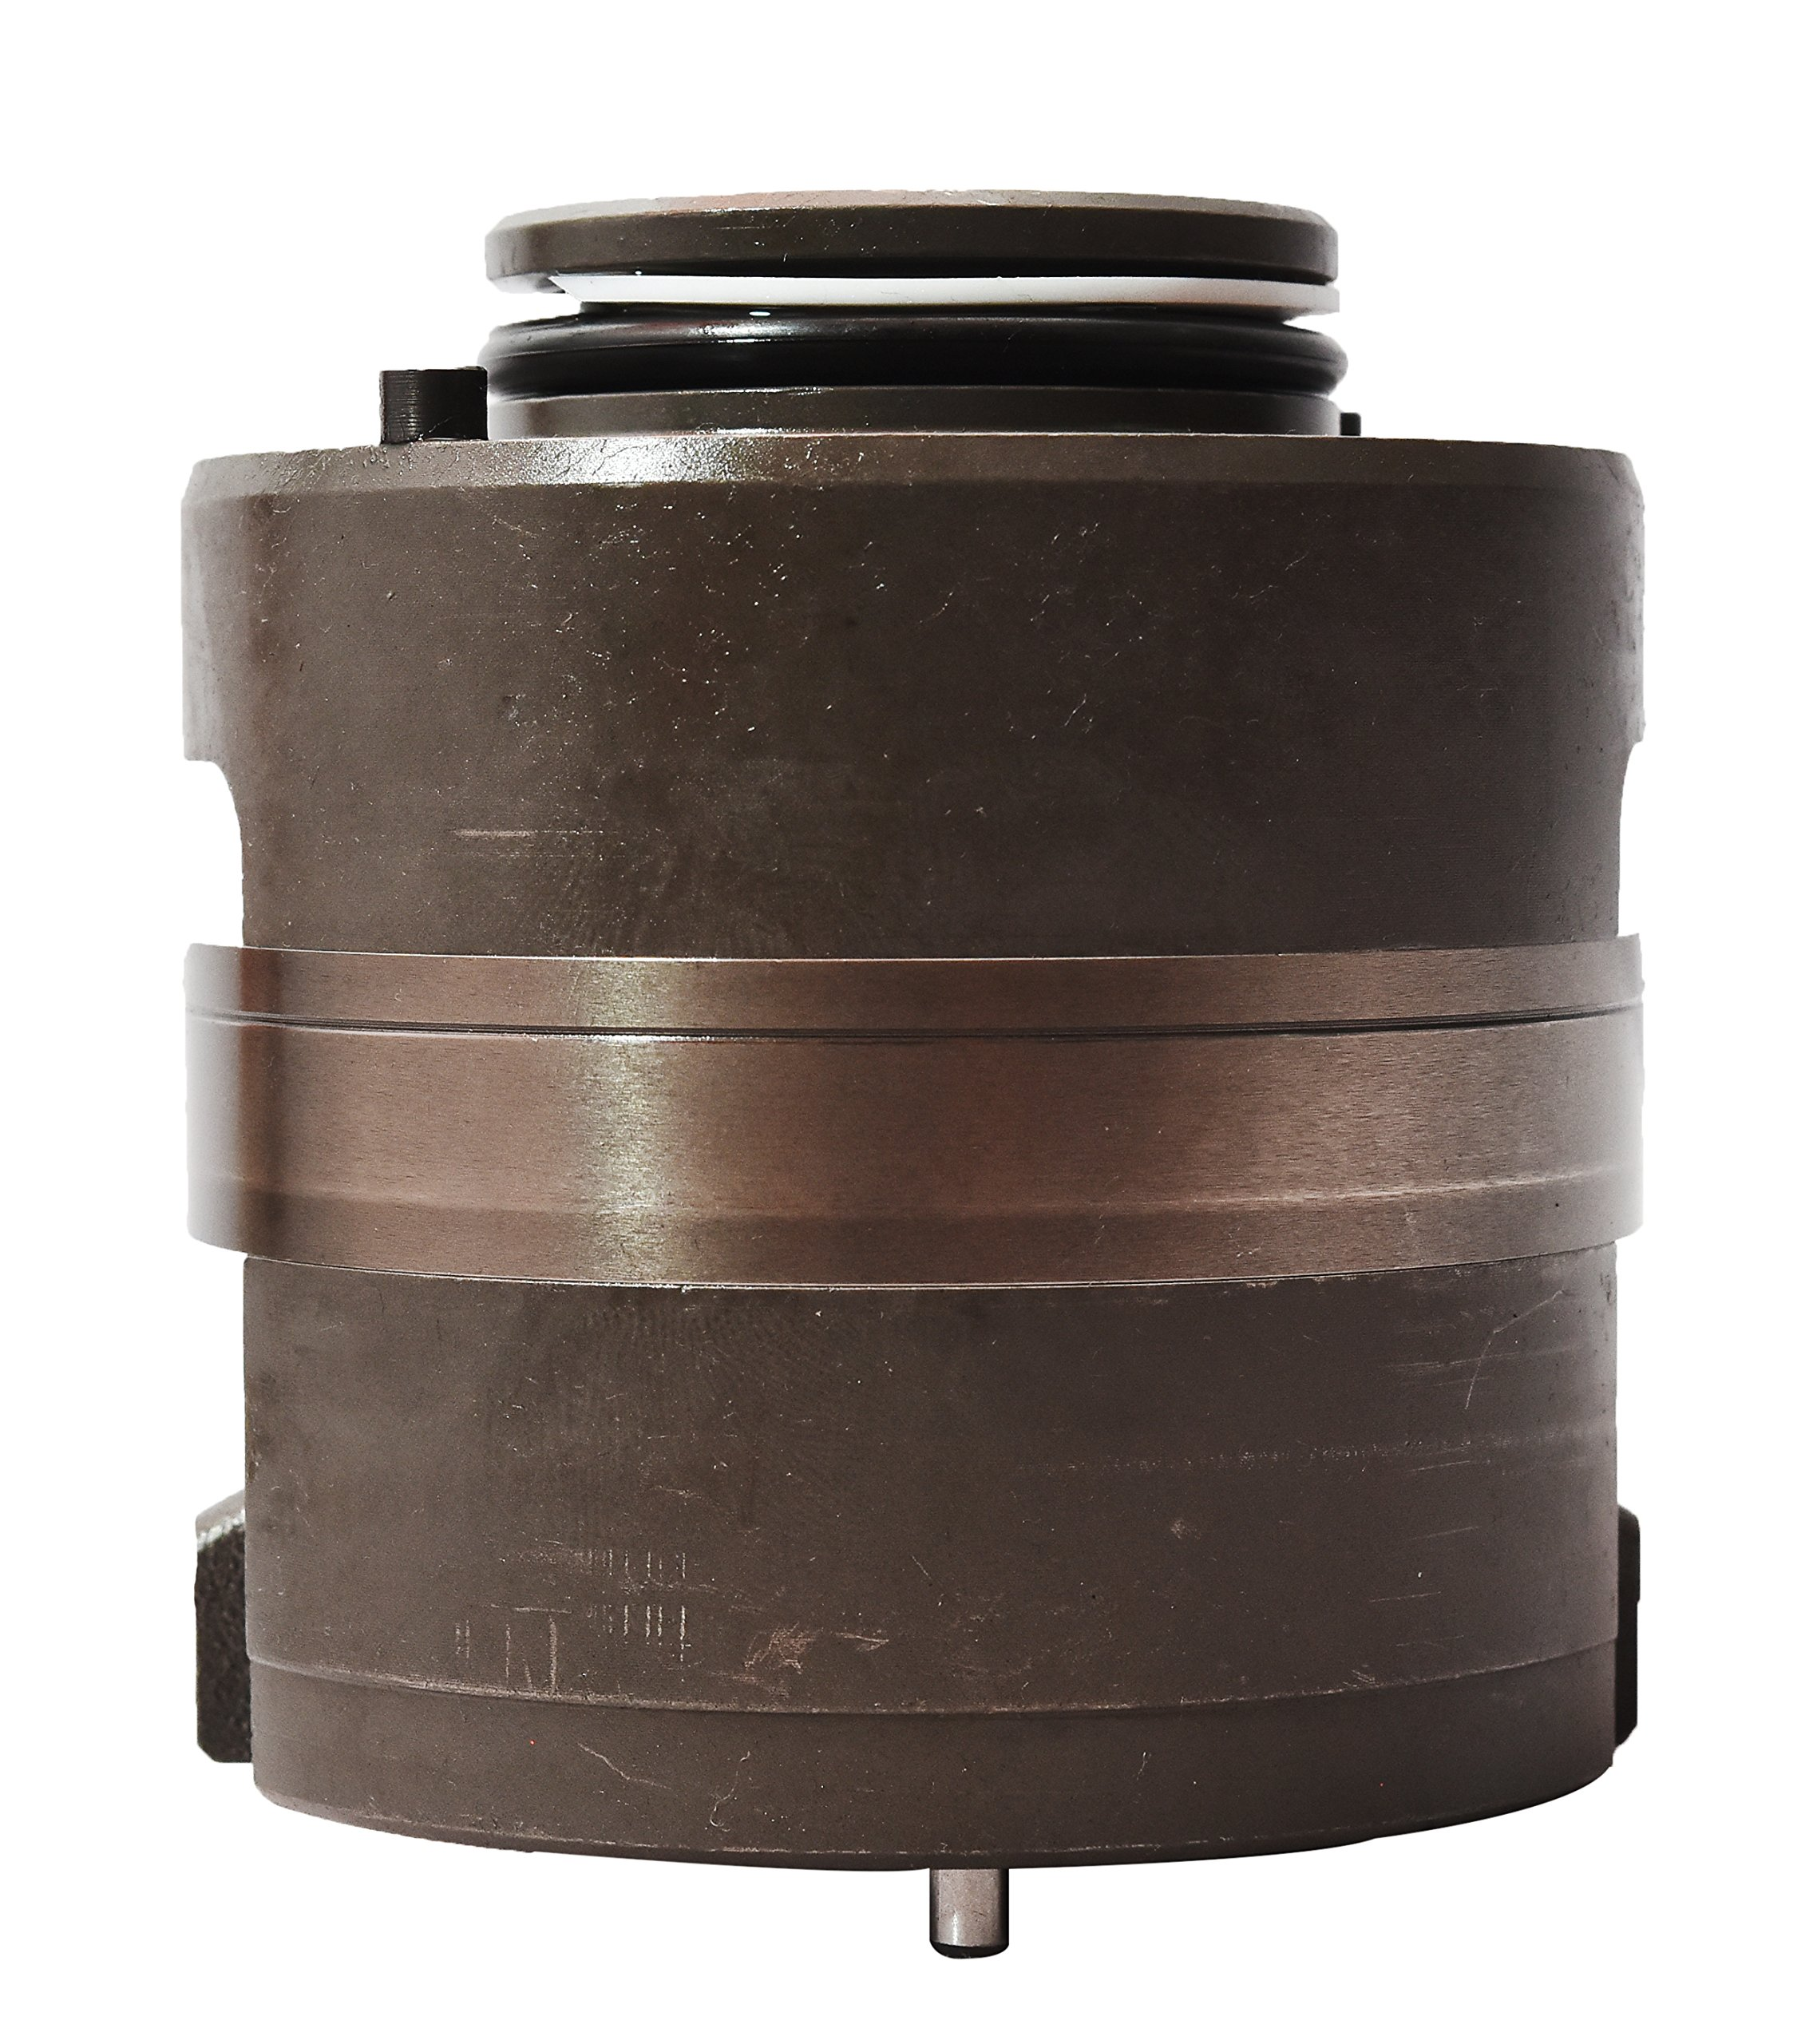 Yuken Hydraulic Vane Pump Spares Catridige Kit CPVR0-30-R-31